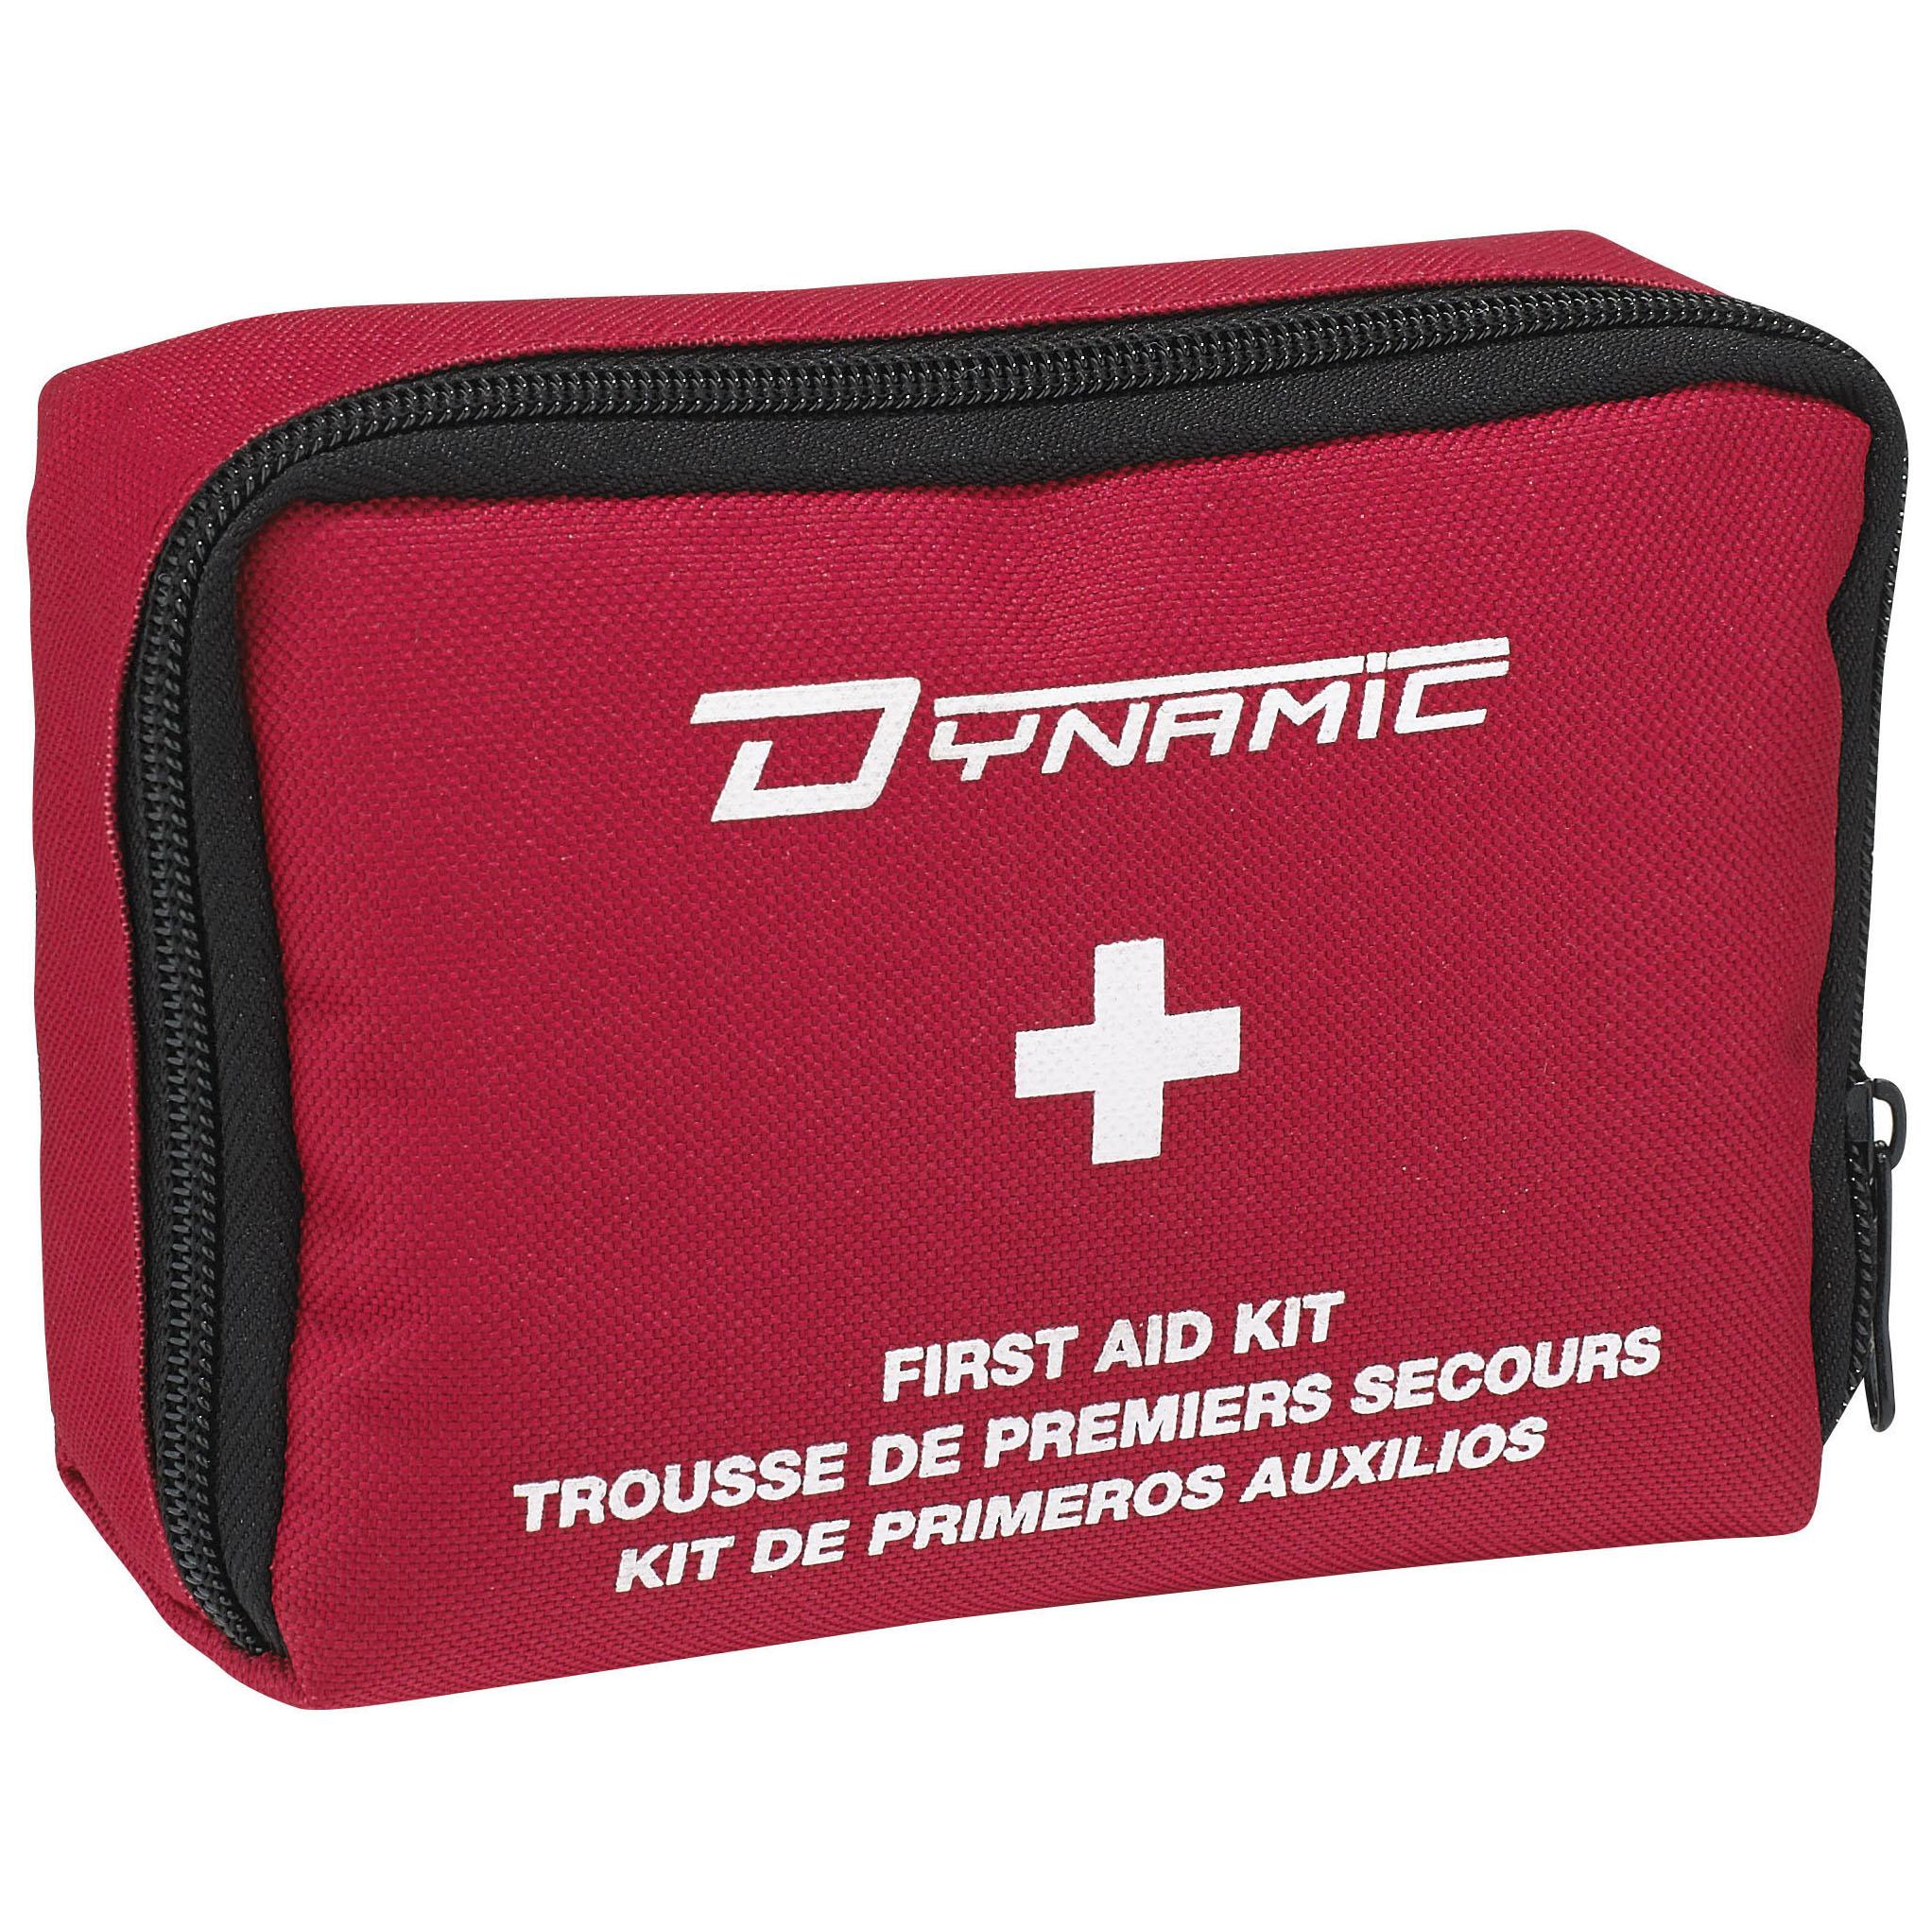 CSA standard First aid kit Type 1 in nylon bag